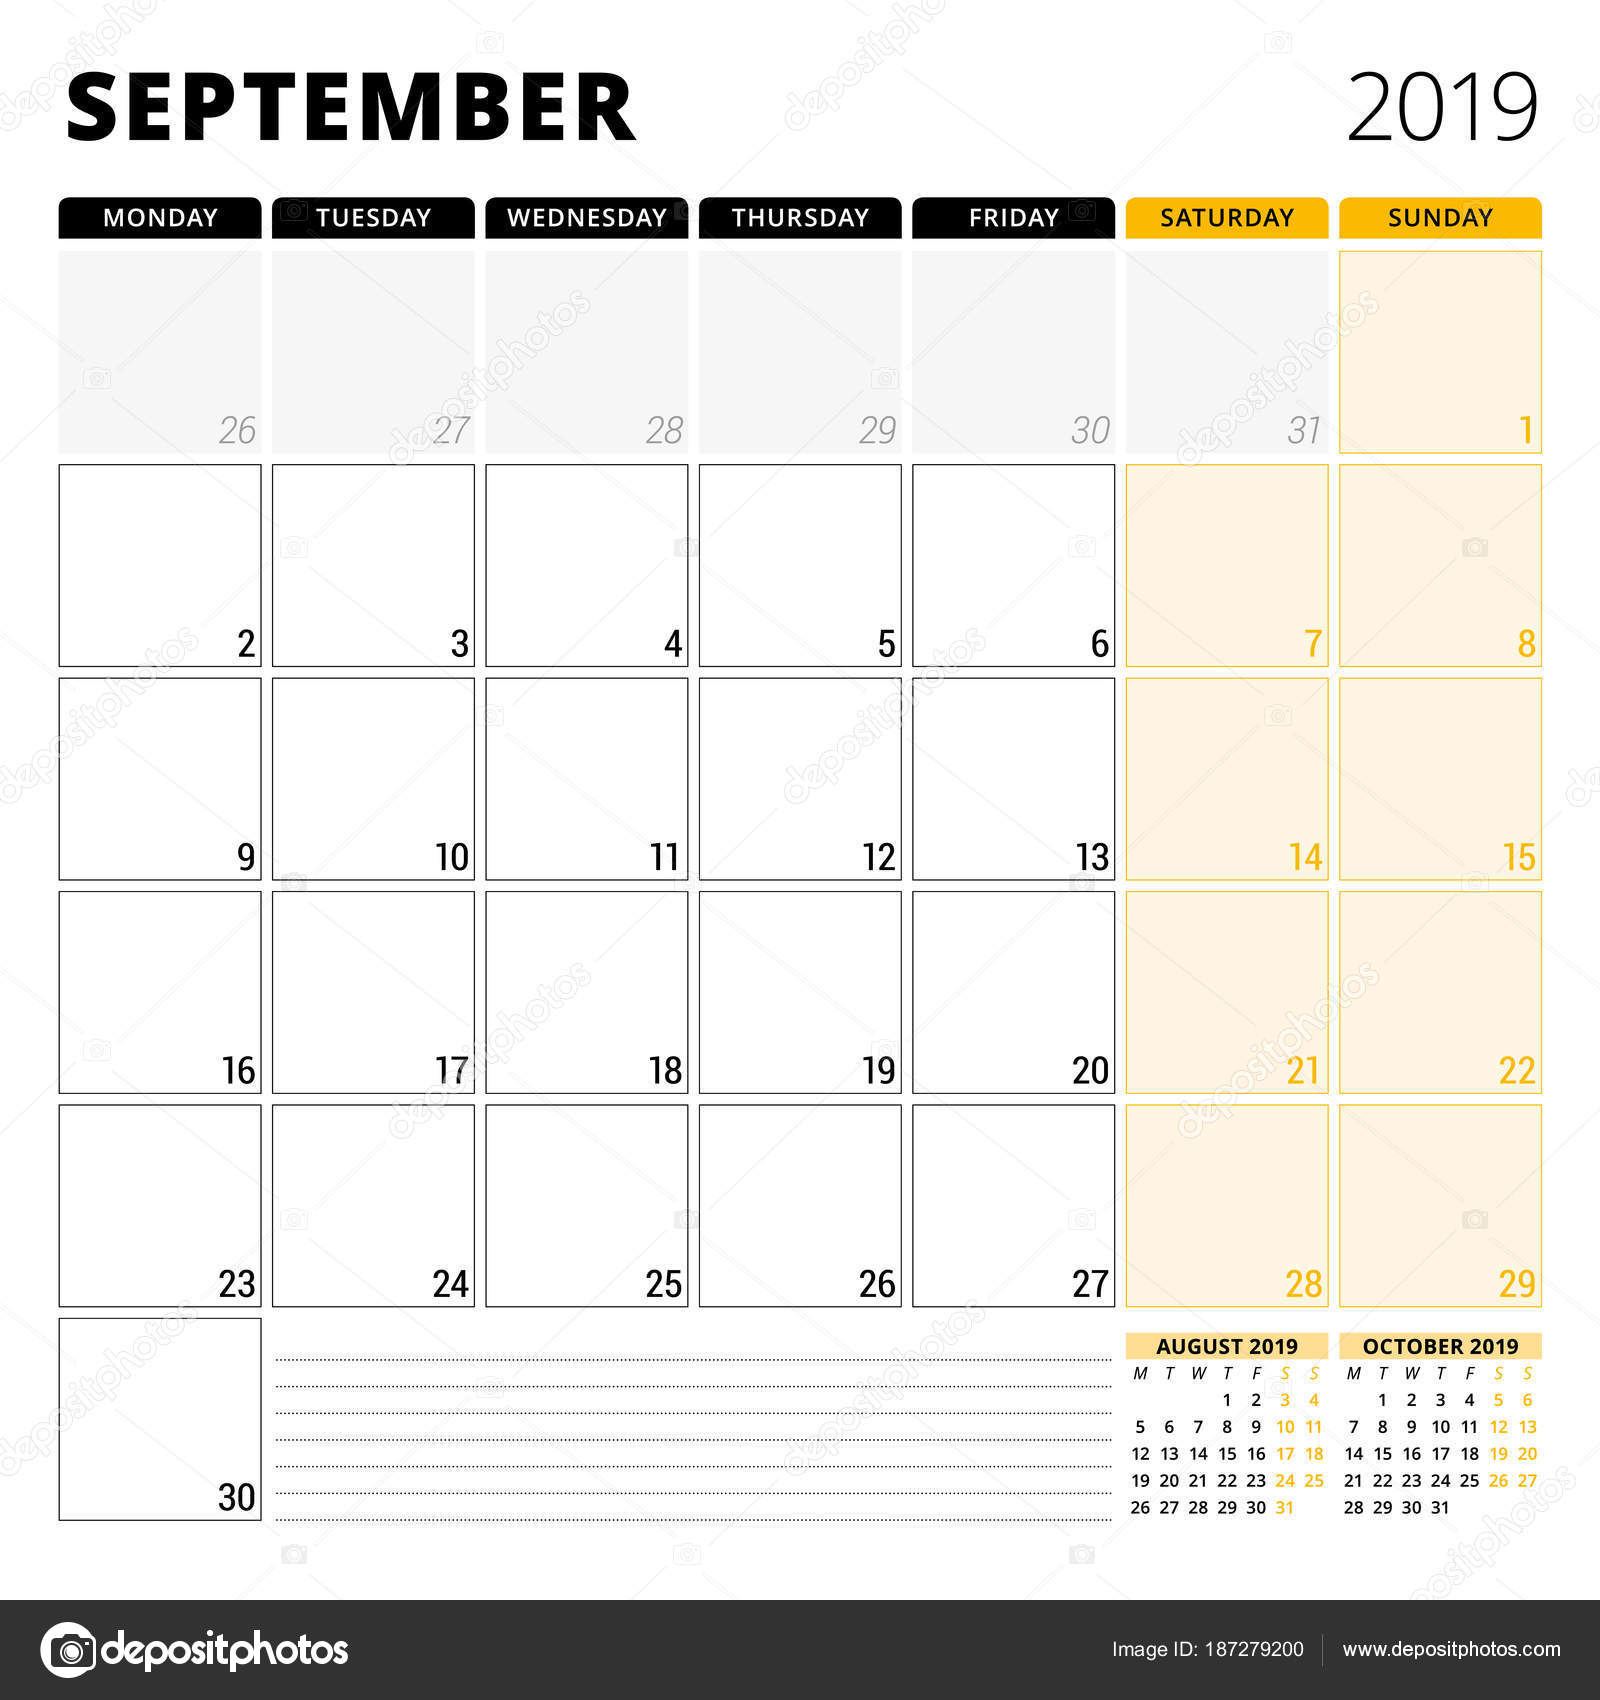 13 Eylül 2019 Pazartesi